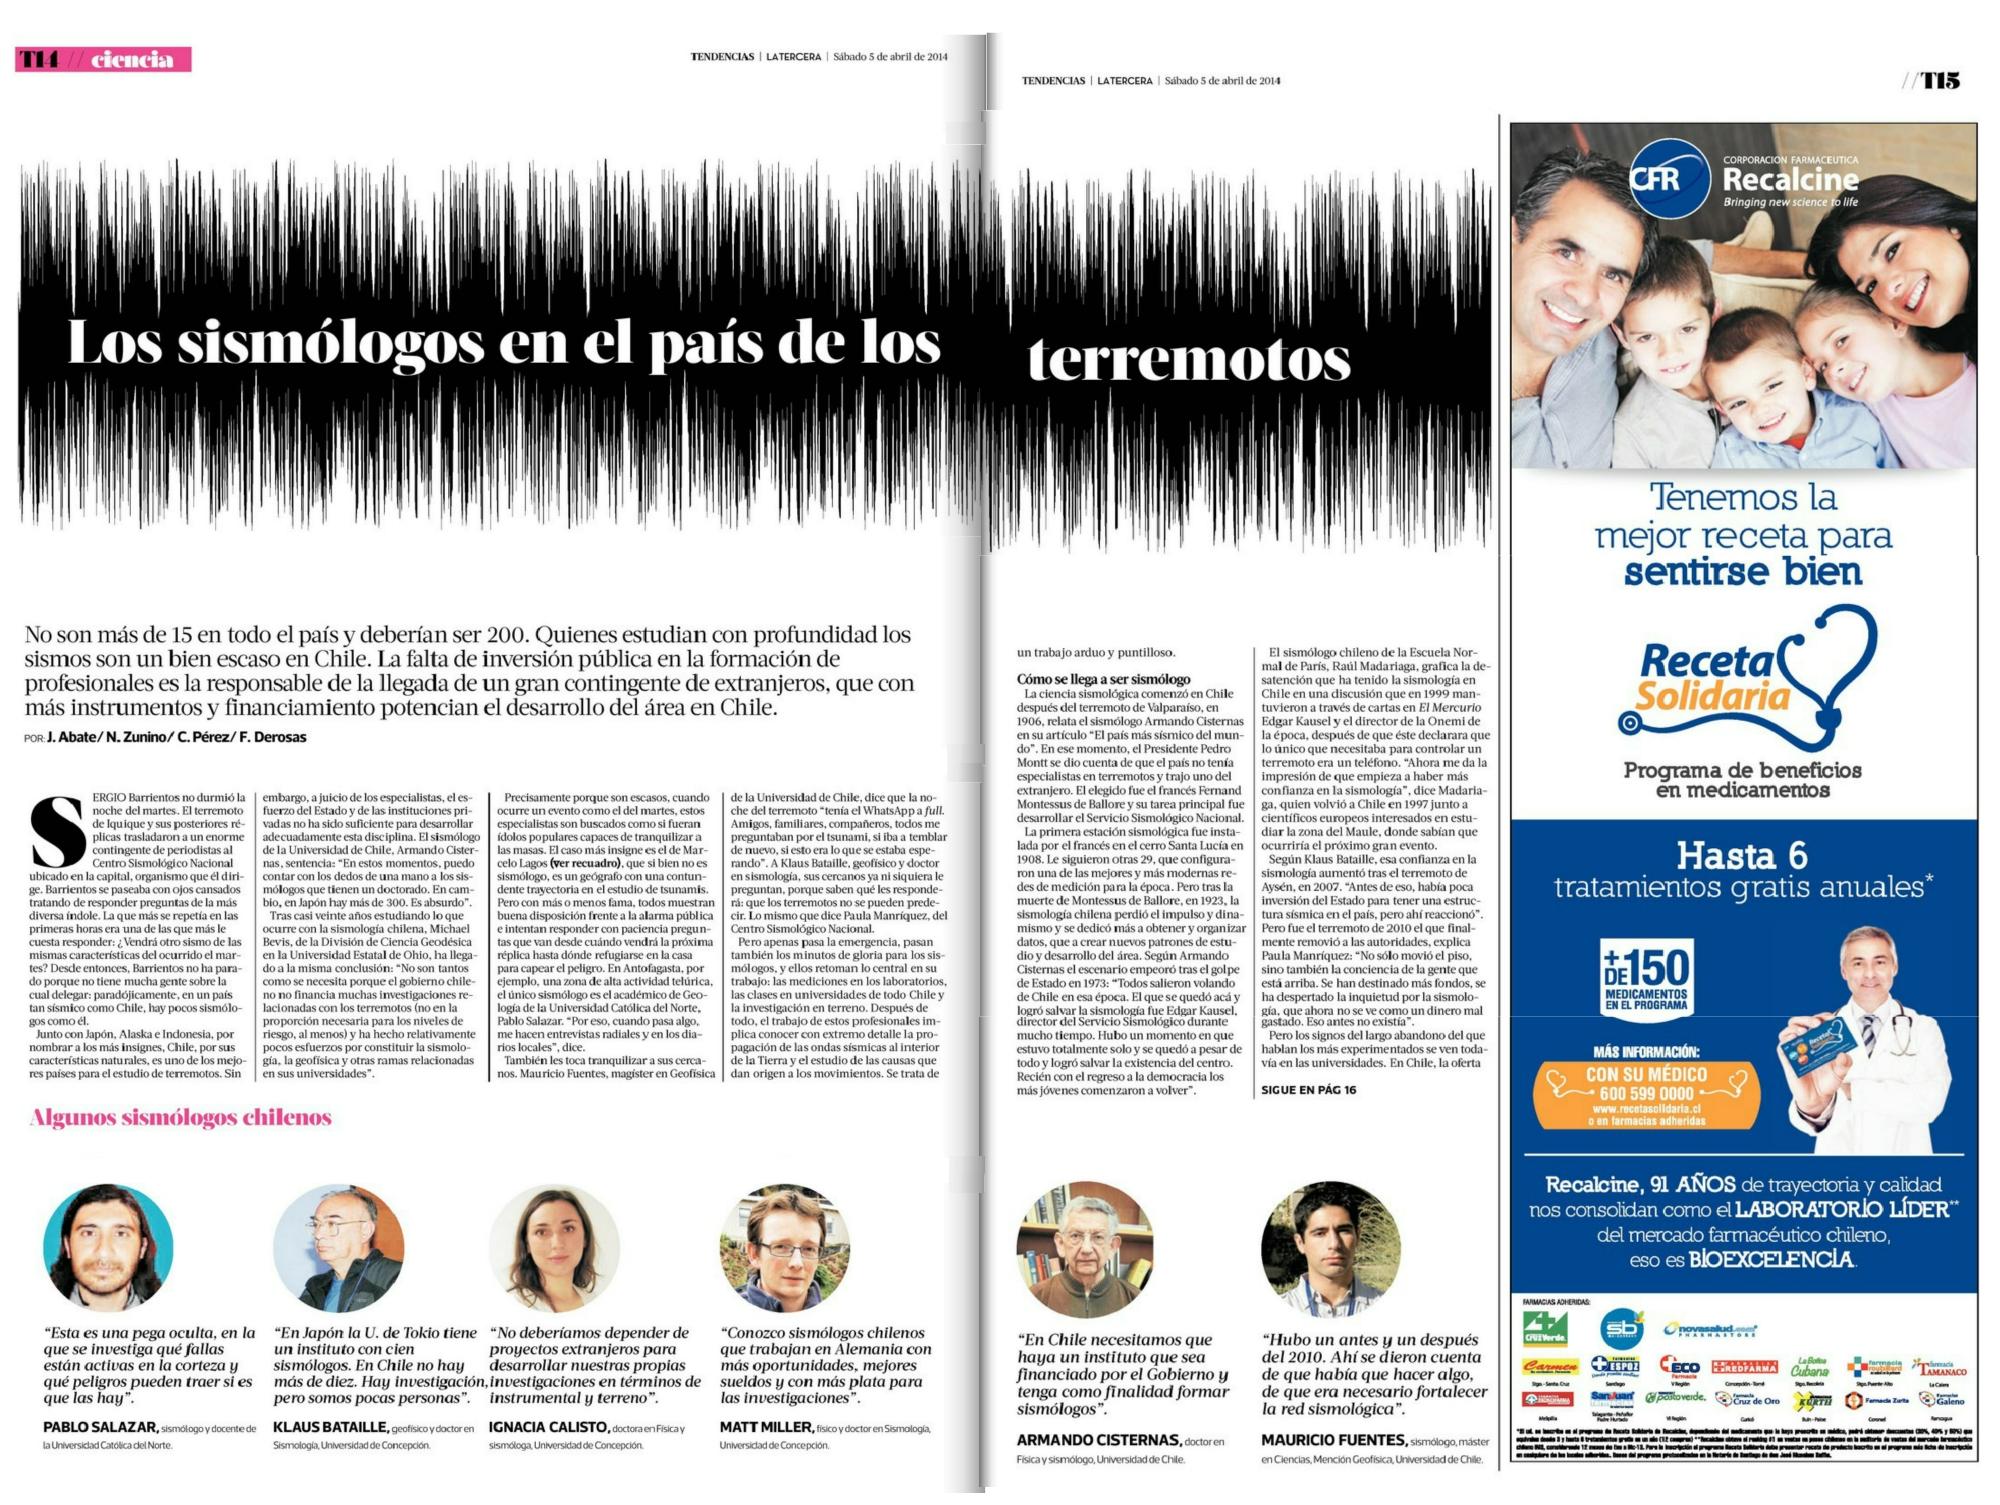 Prensa_5 abril 2014_la tercera